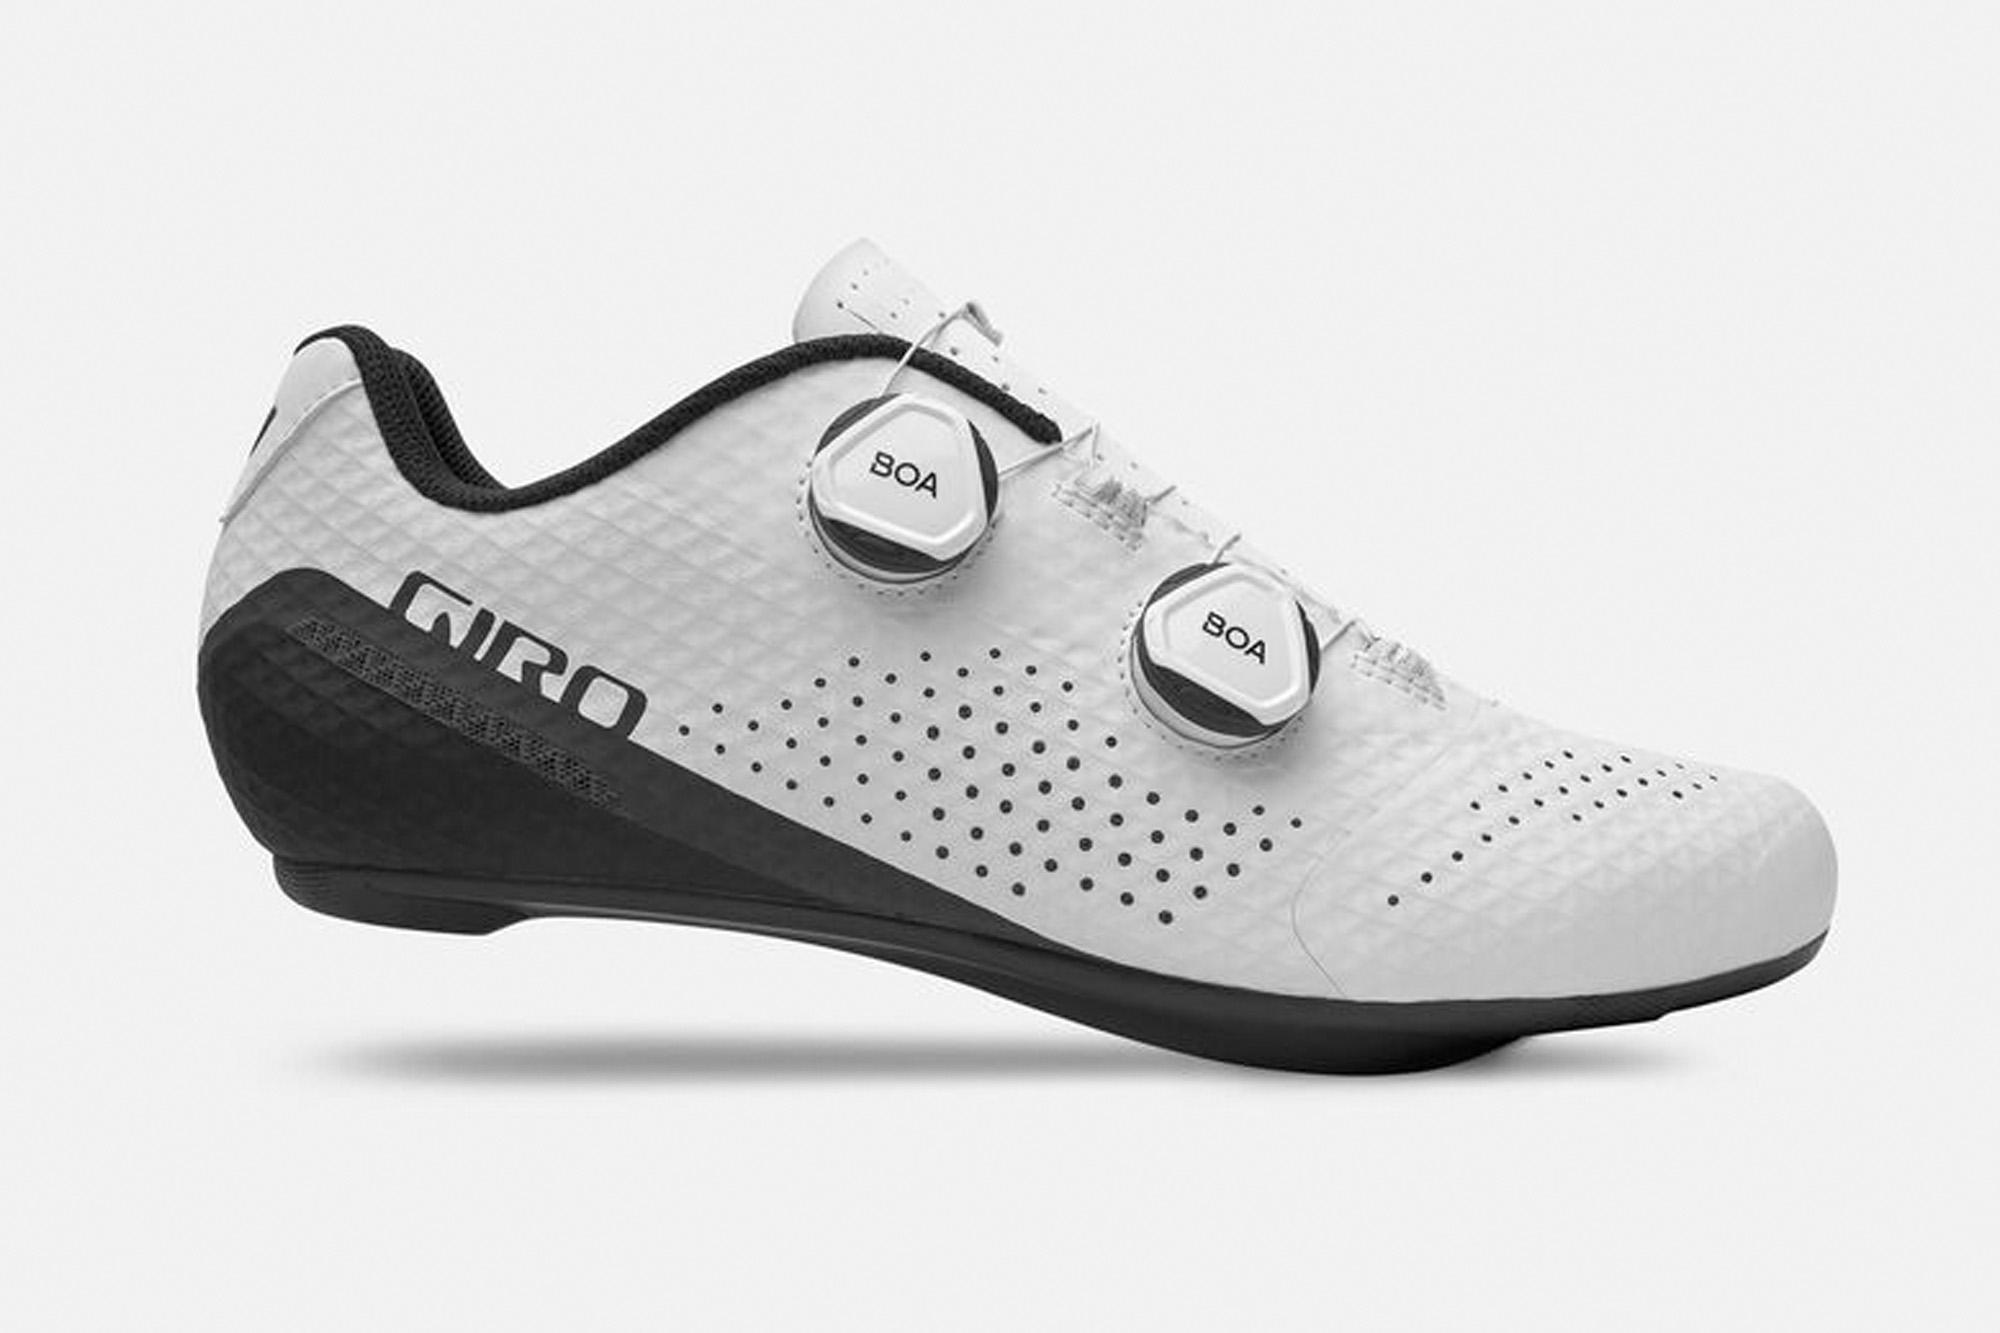 Giro cykelsko: Giro Regime